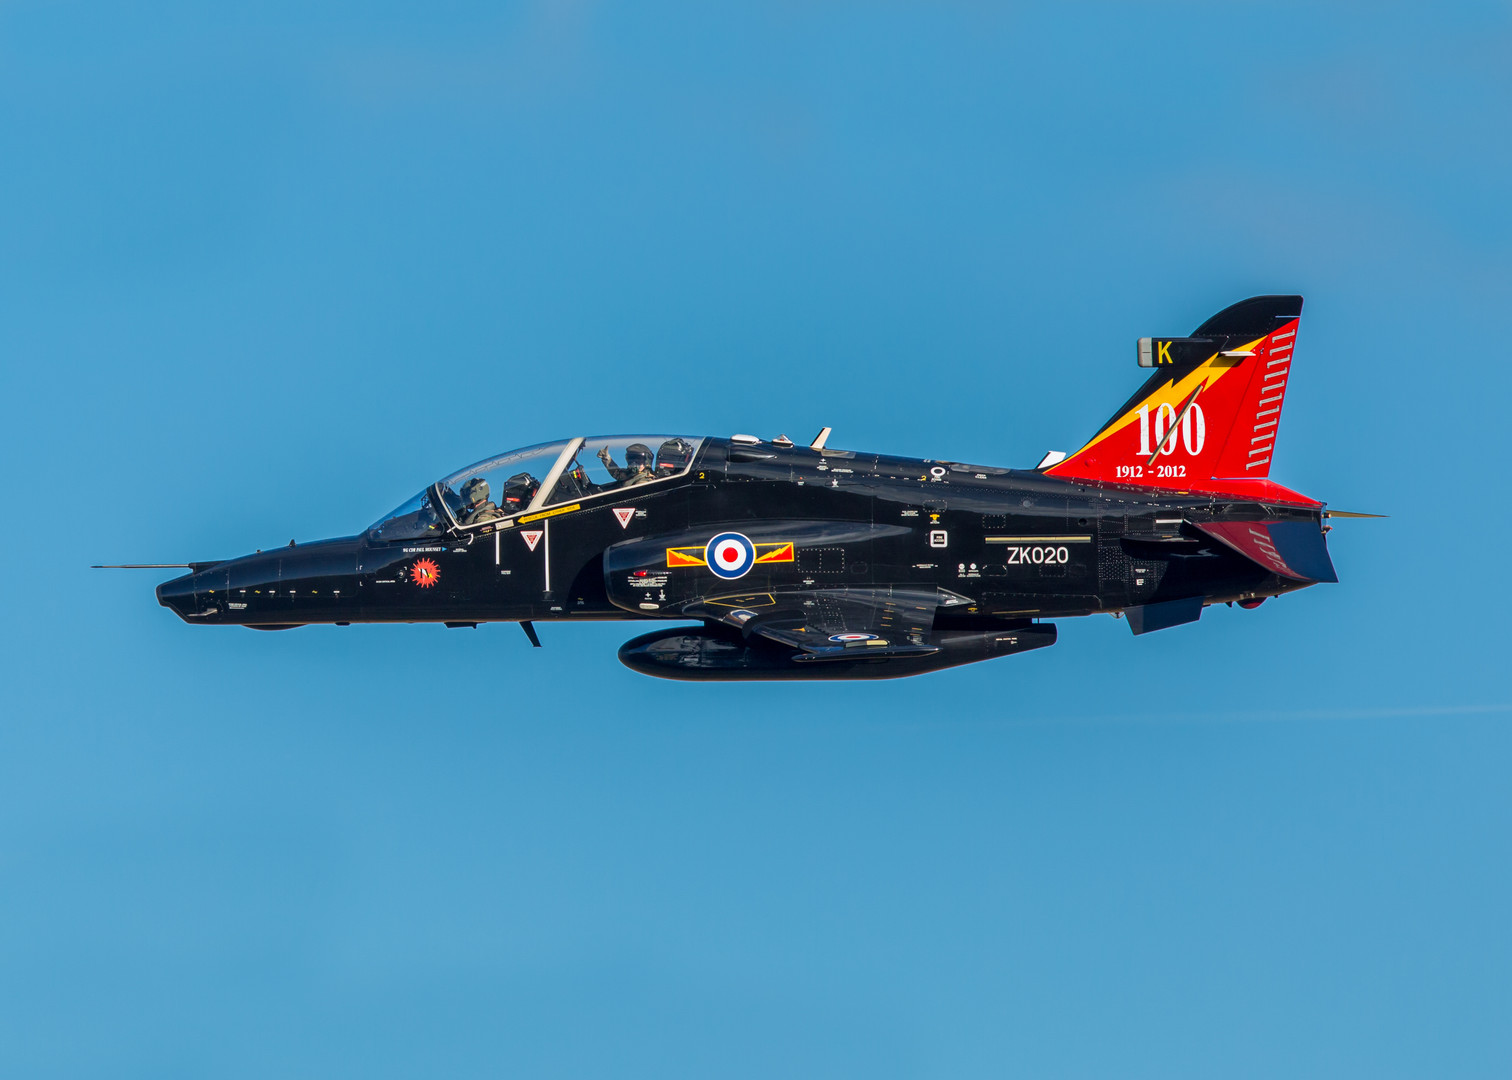 4 Squadron Hawk T2